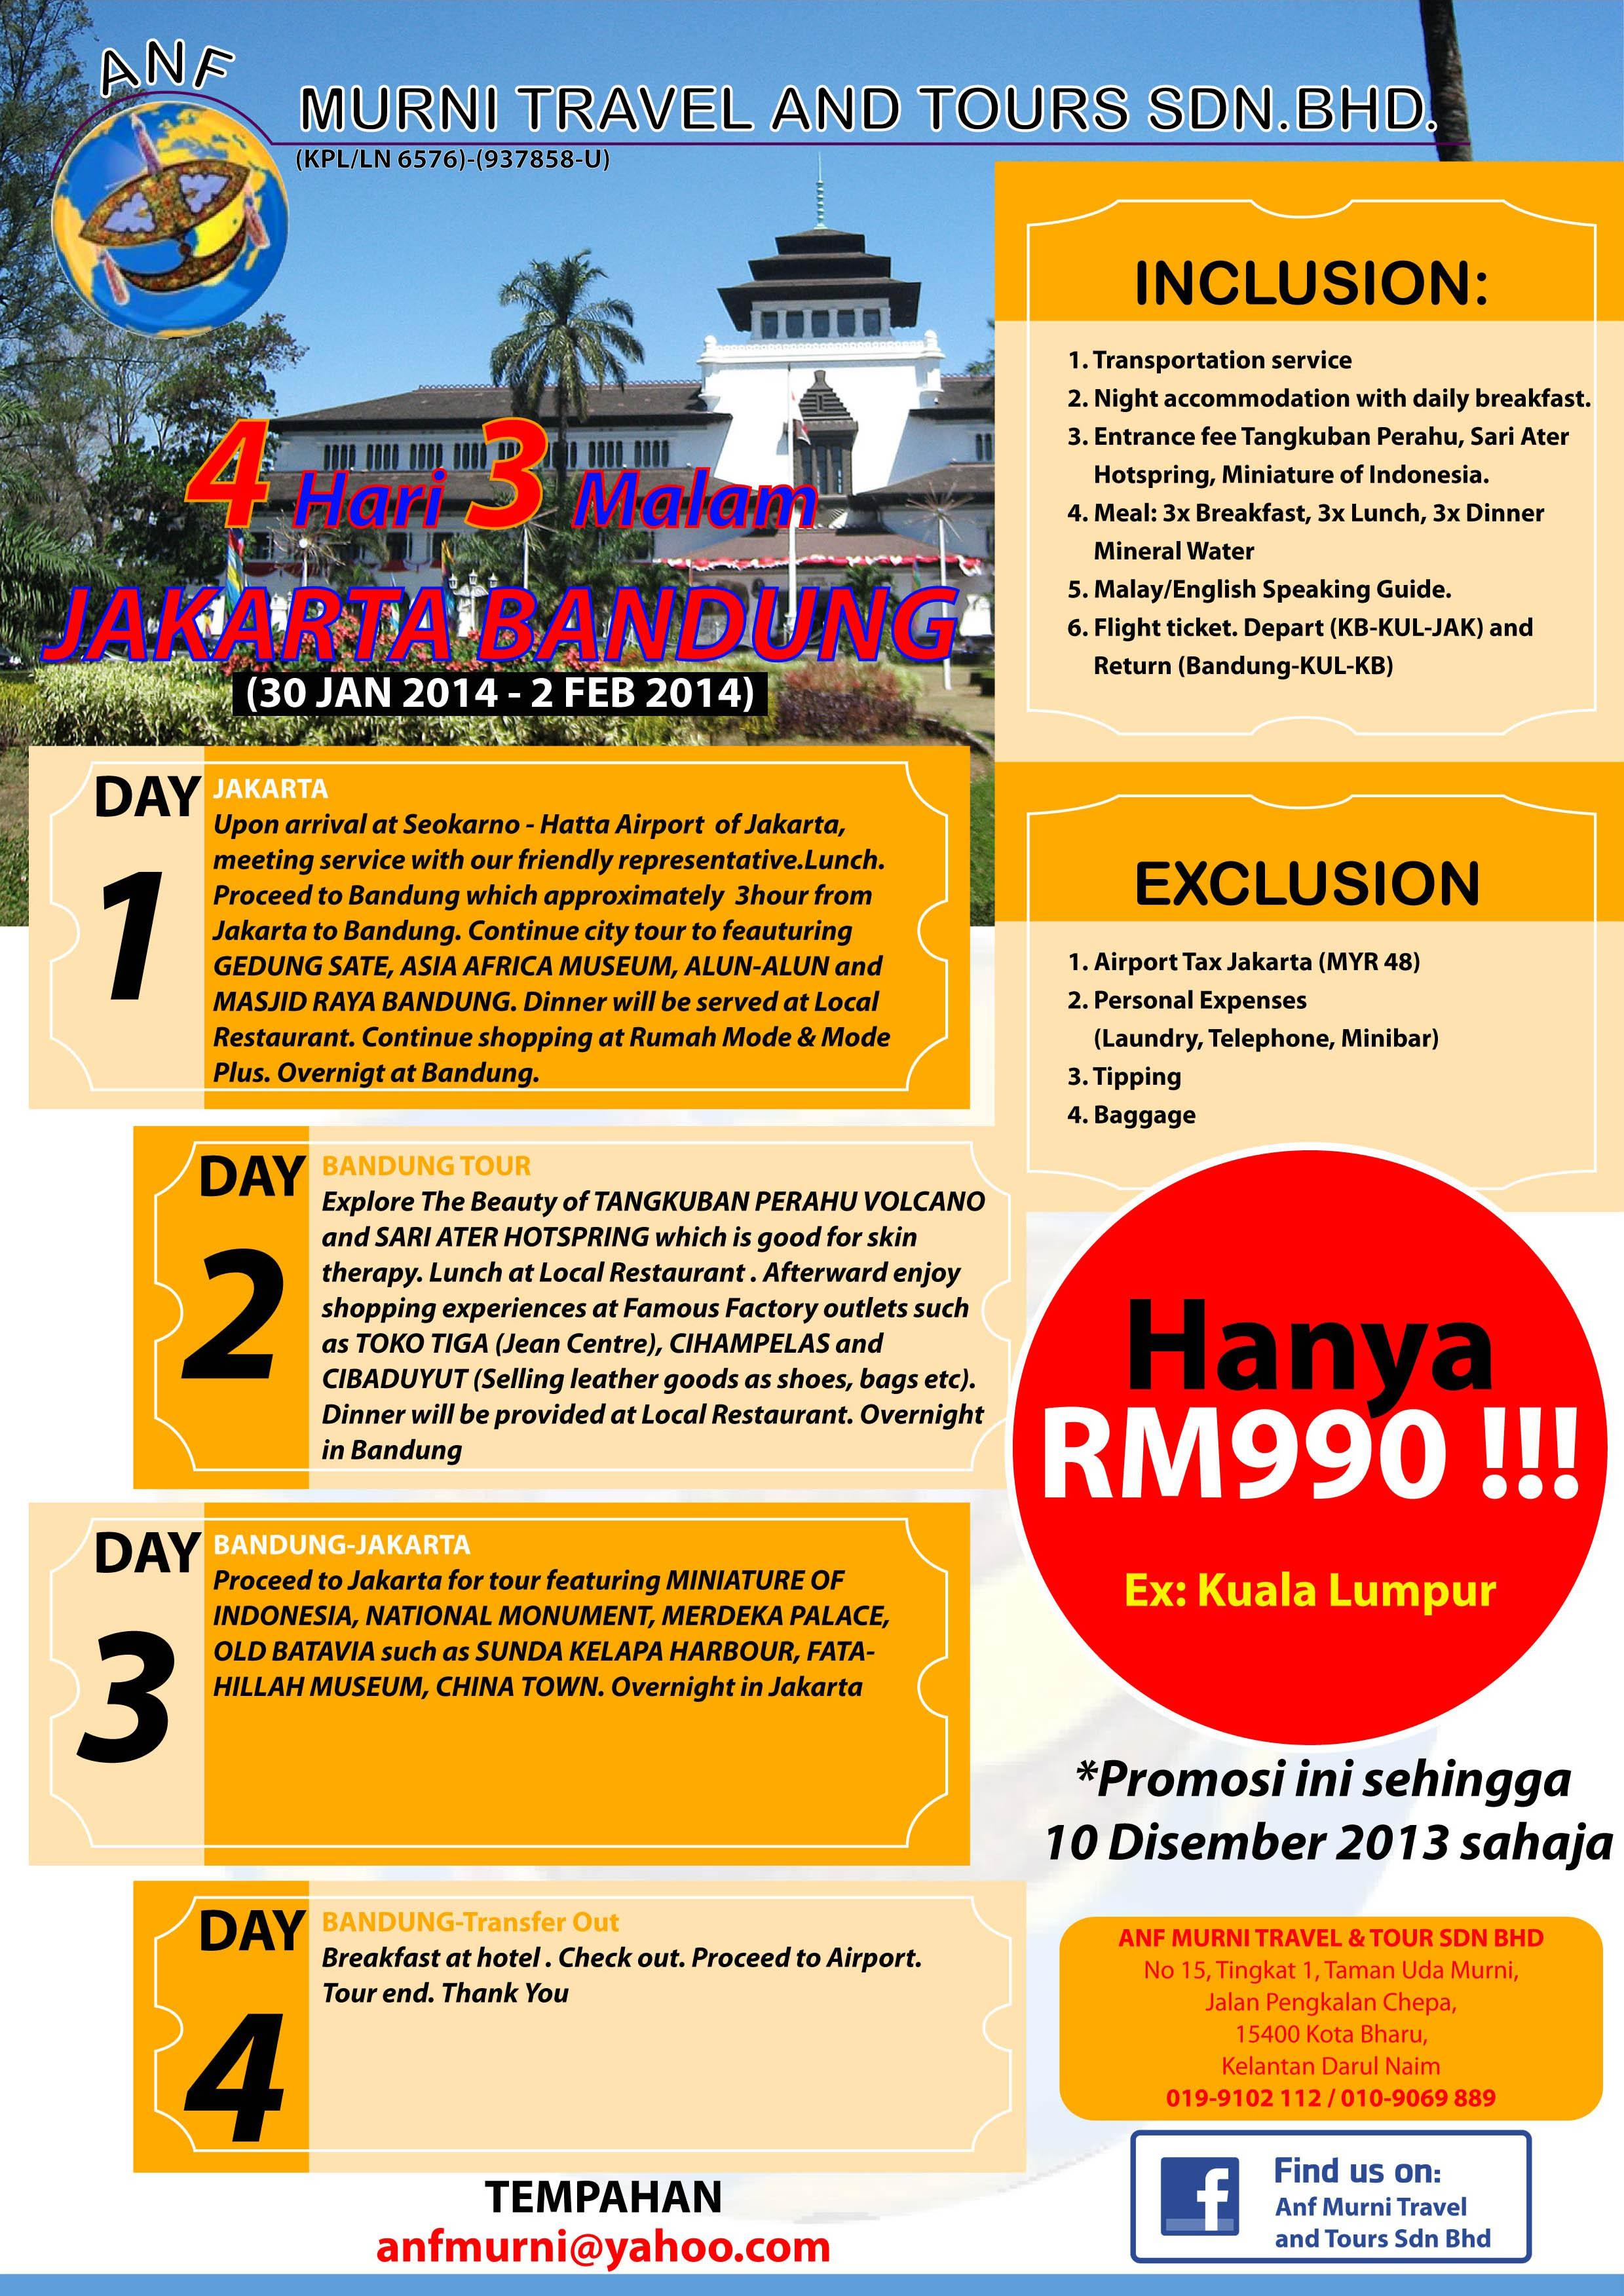 Harga Travel Bandung Jakarta : harga, travel, bandung, jakarta, Murni, Travel, Tours